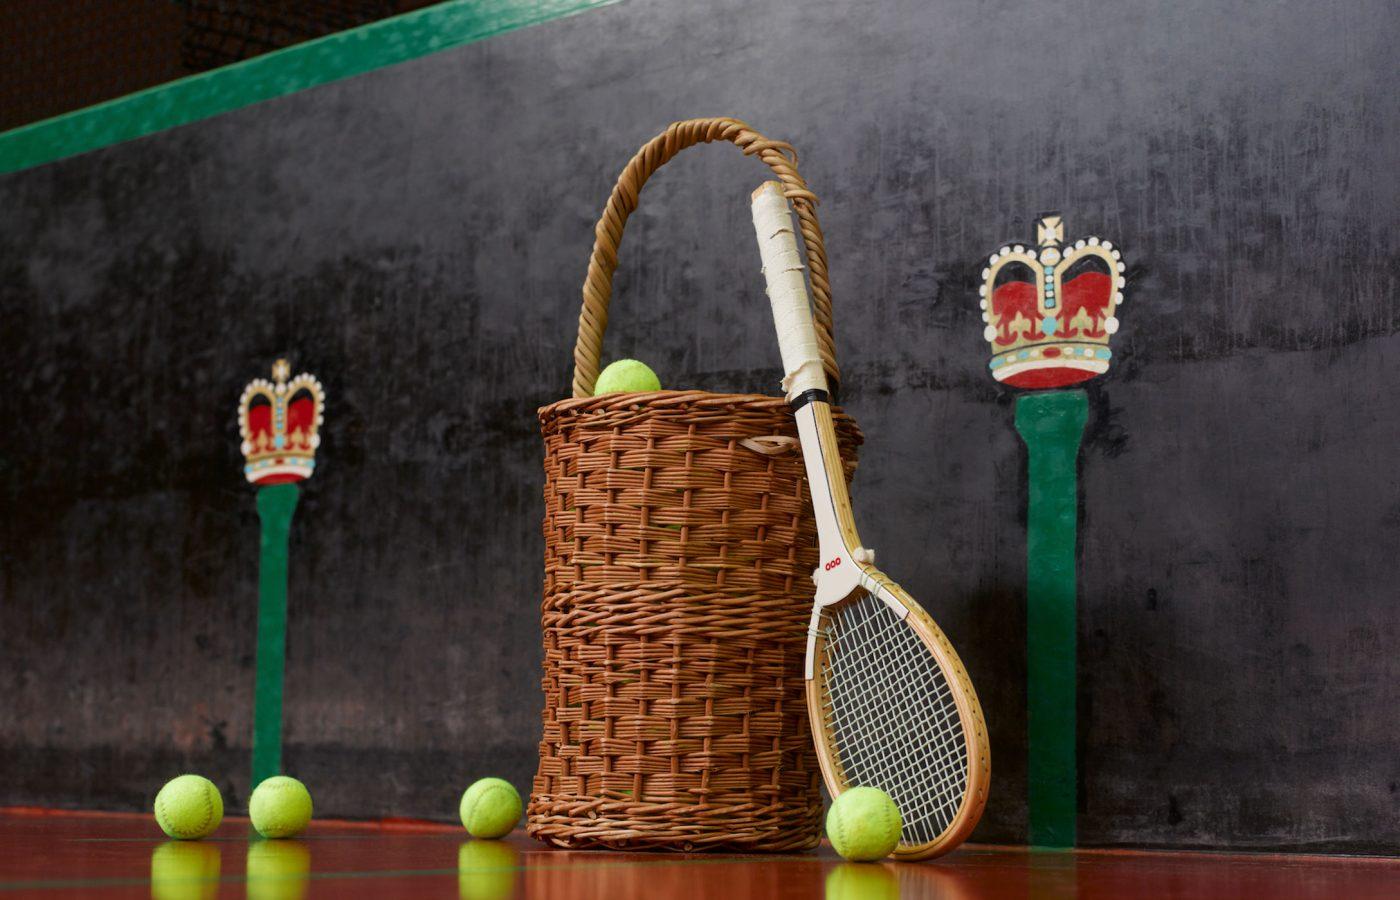 Queens Club Real Tennis Racket